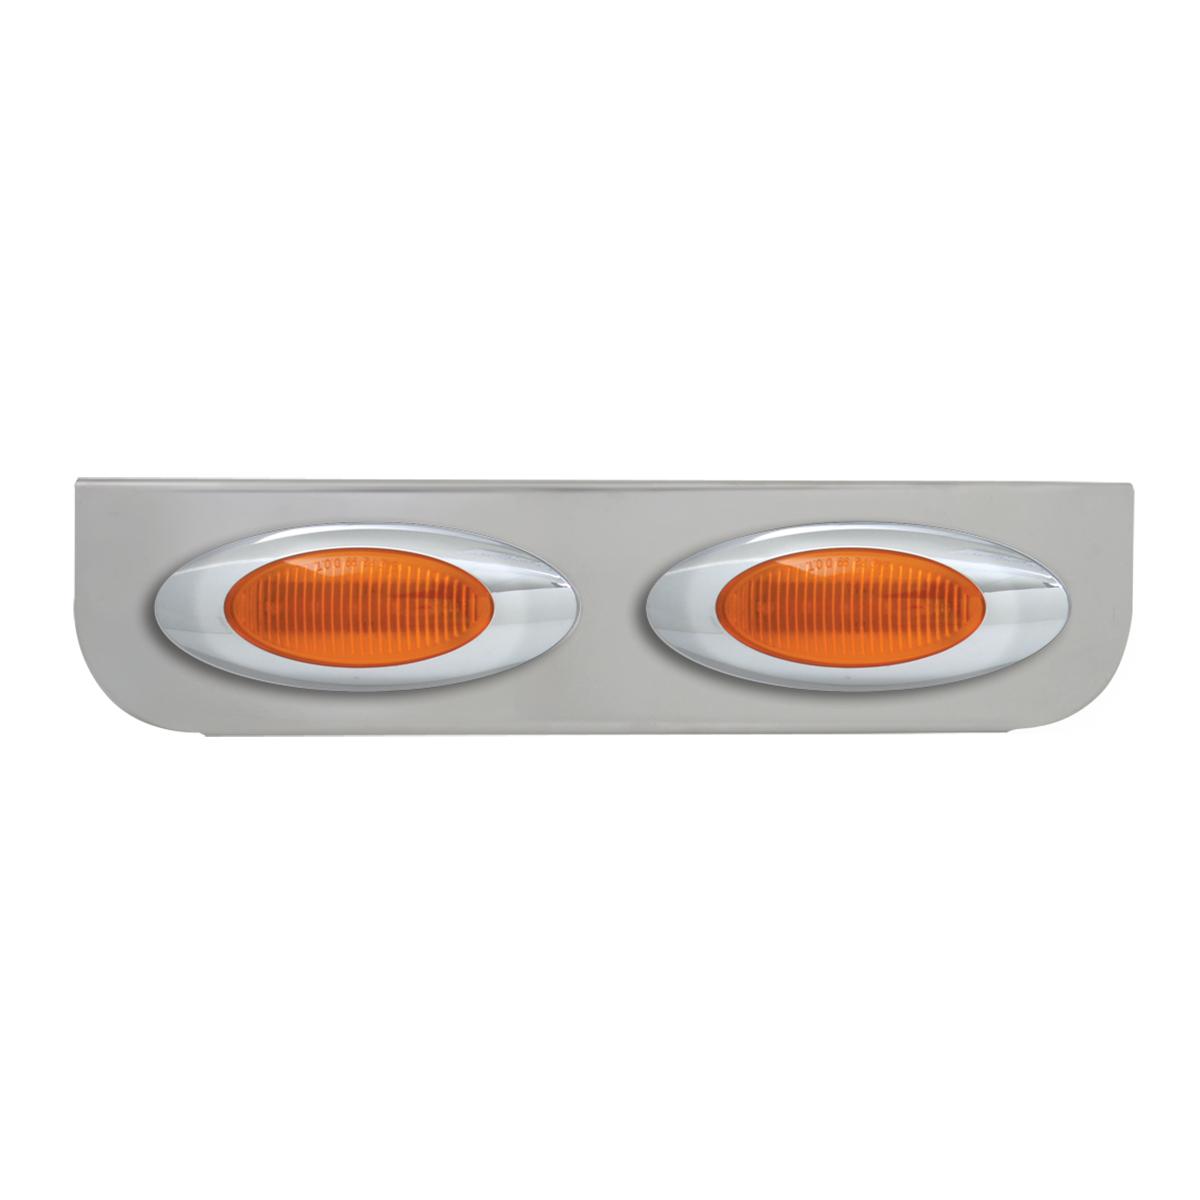 "#89030 Double Chrome ""L"" Shape Light Bracket with Plug-In Y2K Incandescent Light"